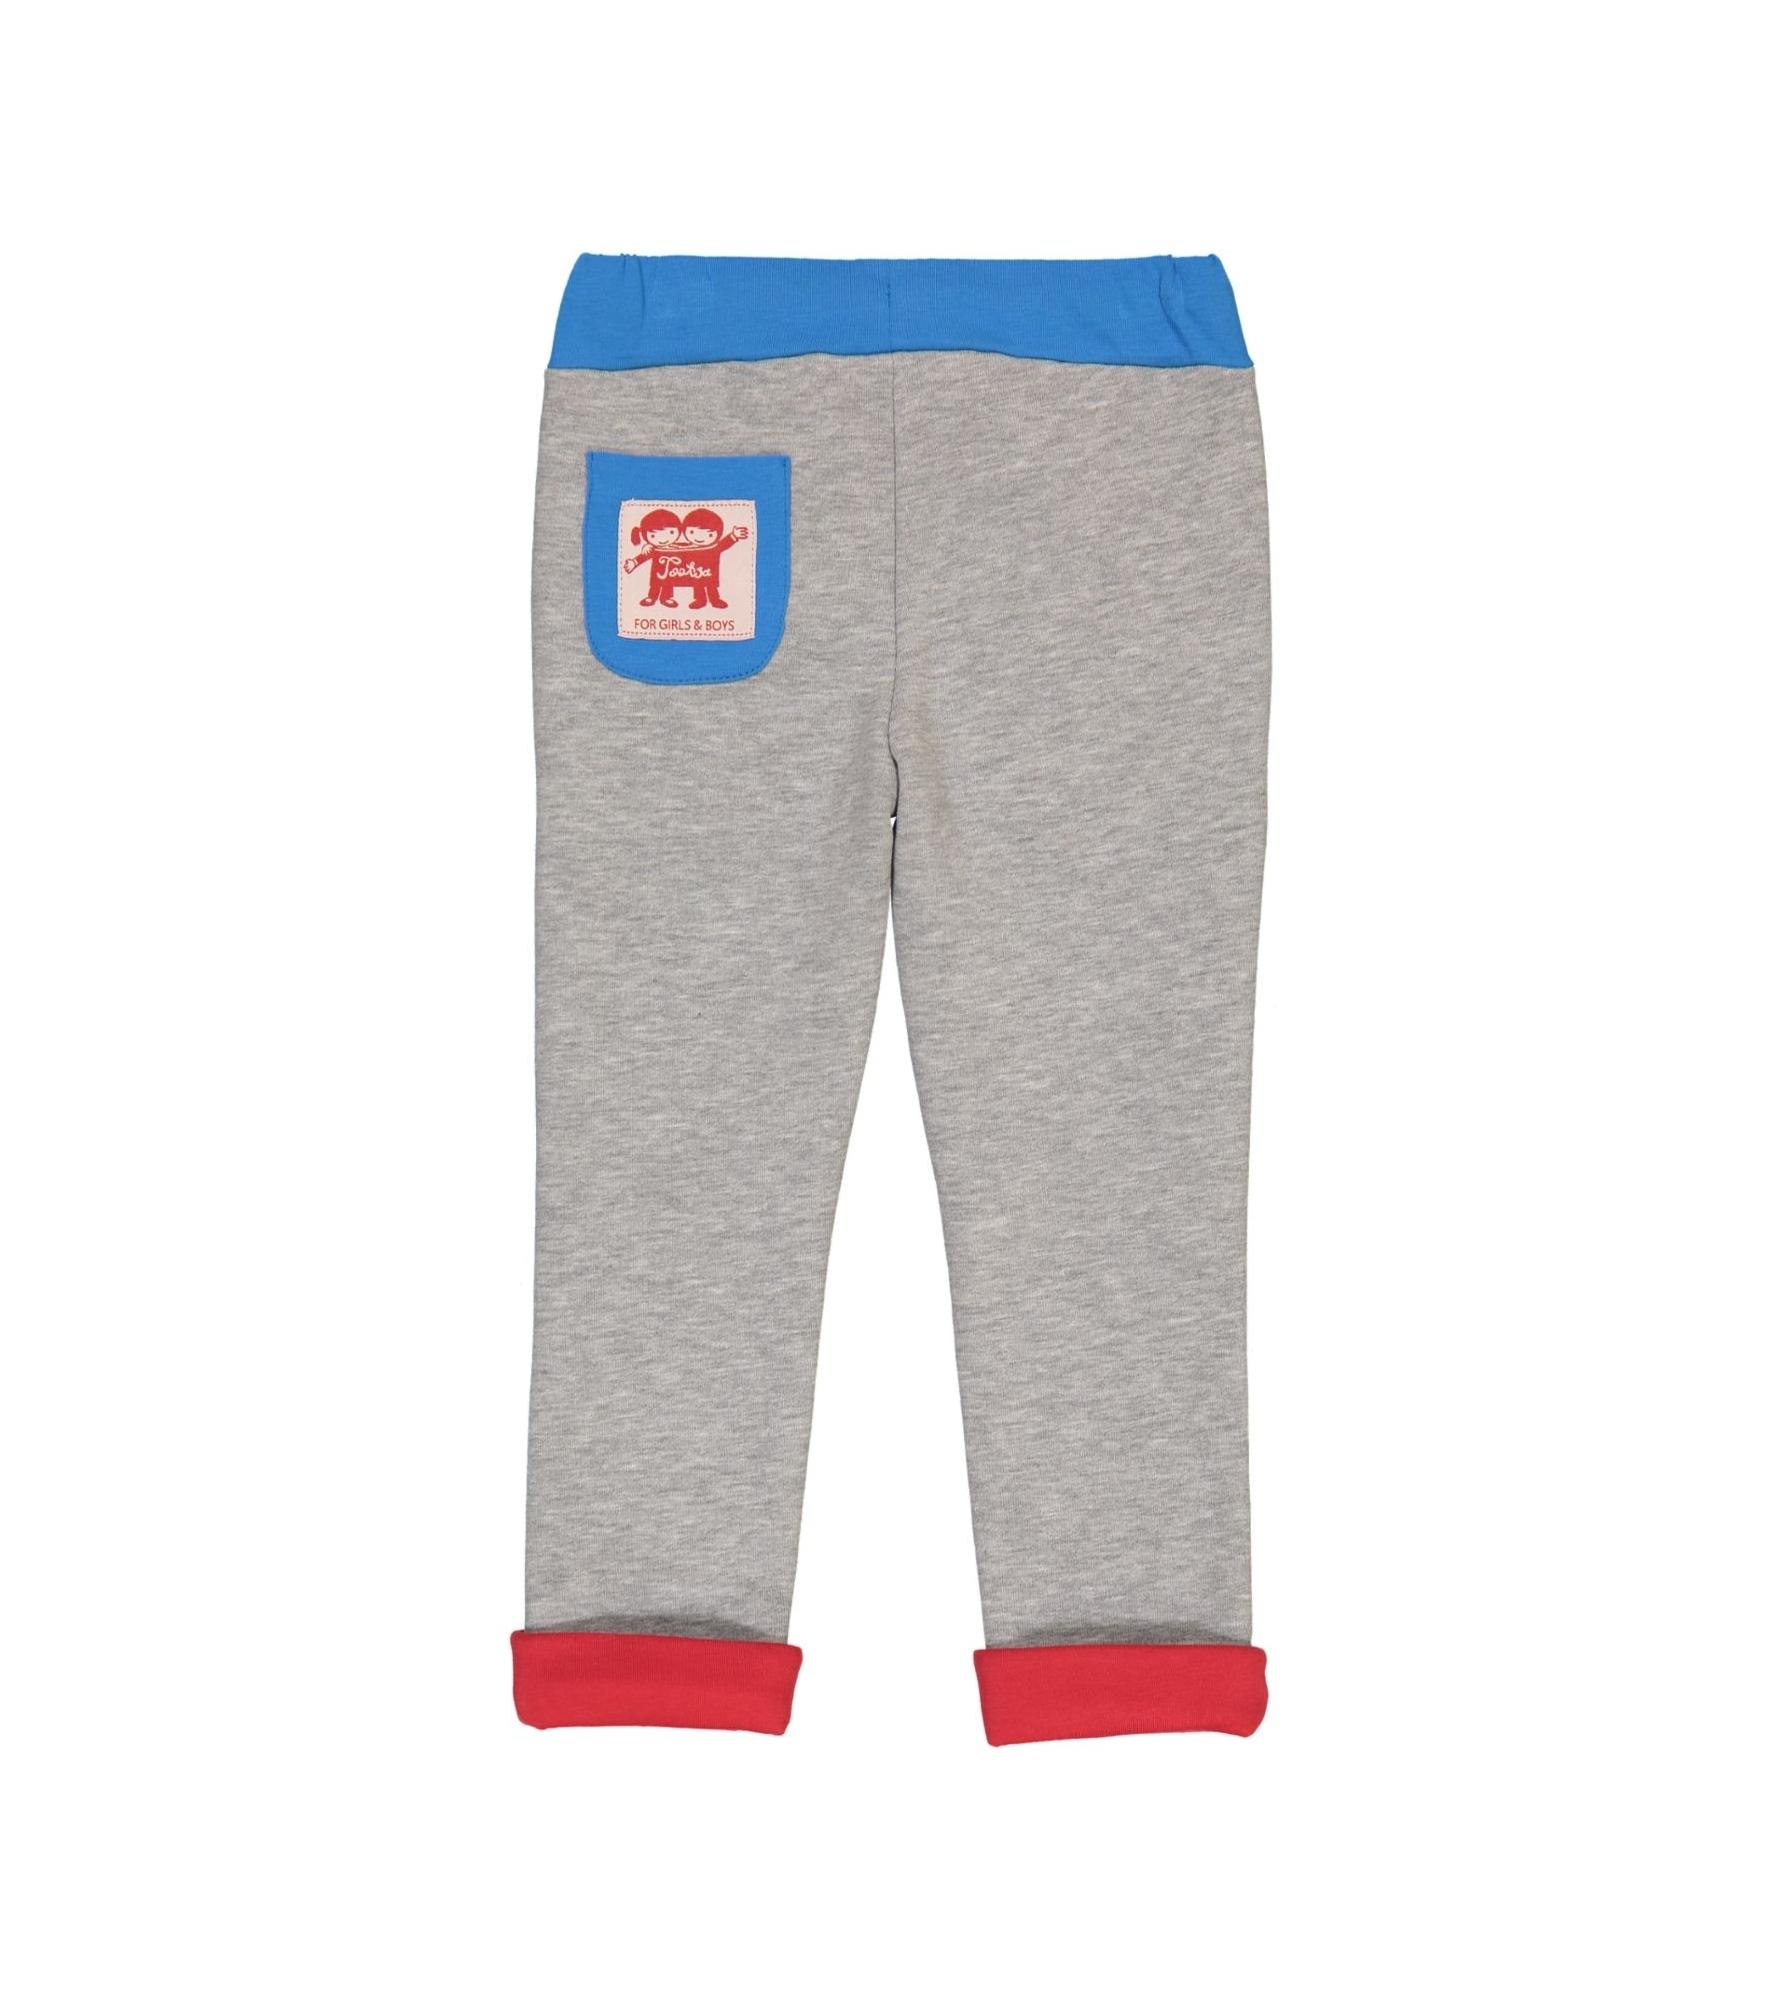 Malmo Slim Fit Sweatpants Light Heather Grey Back_downsized.jpg